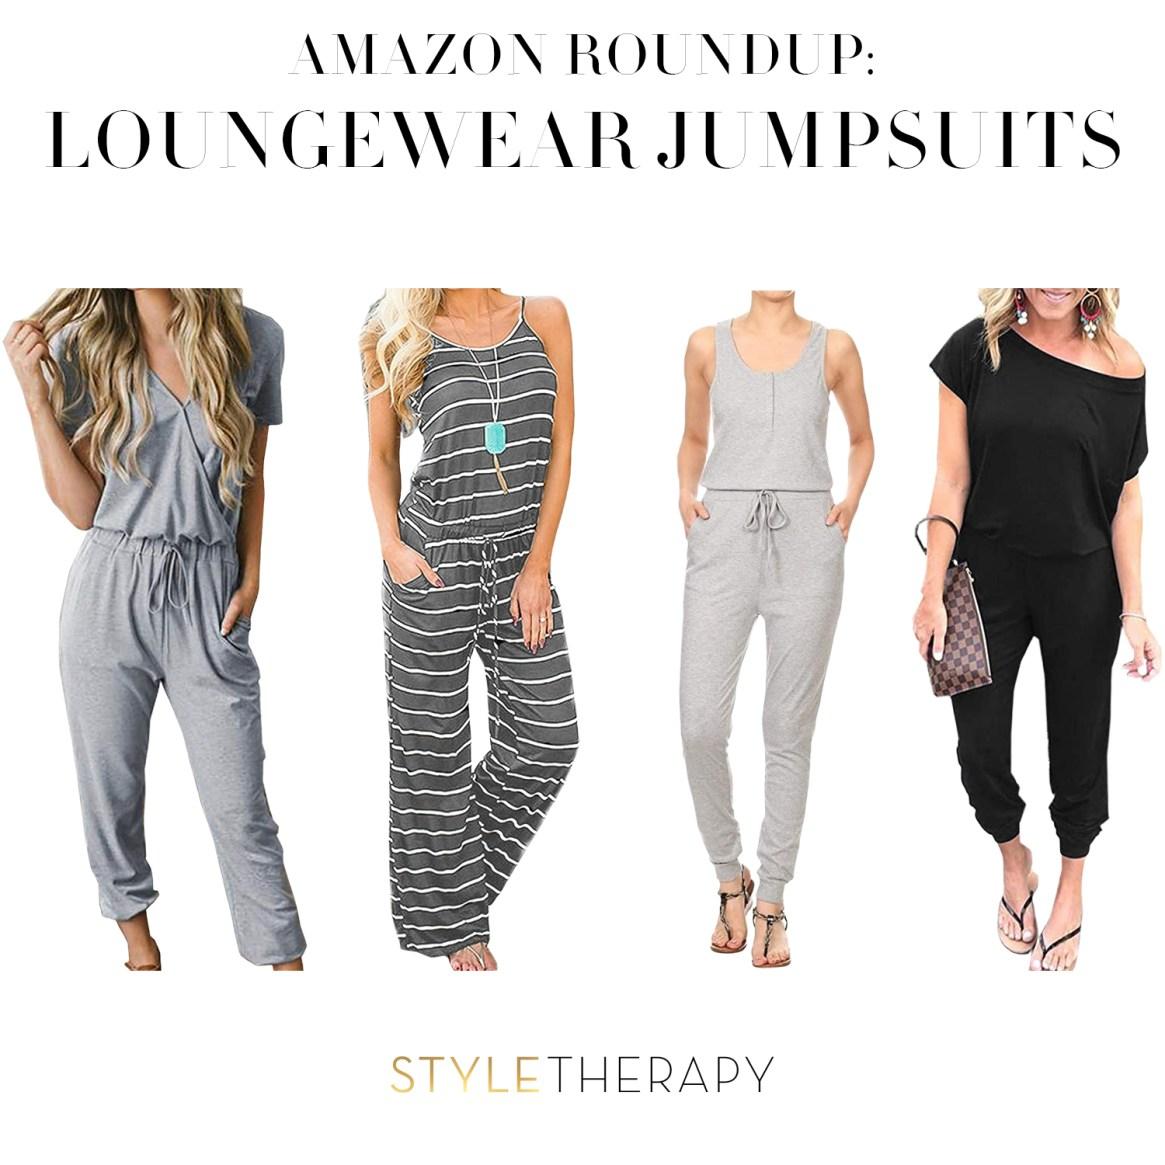 Amazon Roundup Loungewear Jumpsuits Instagram